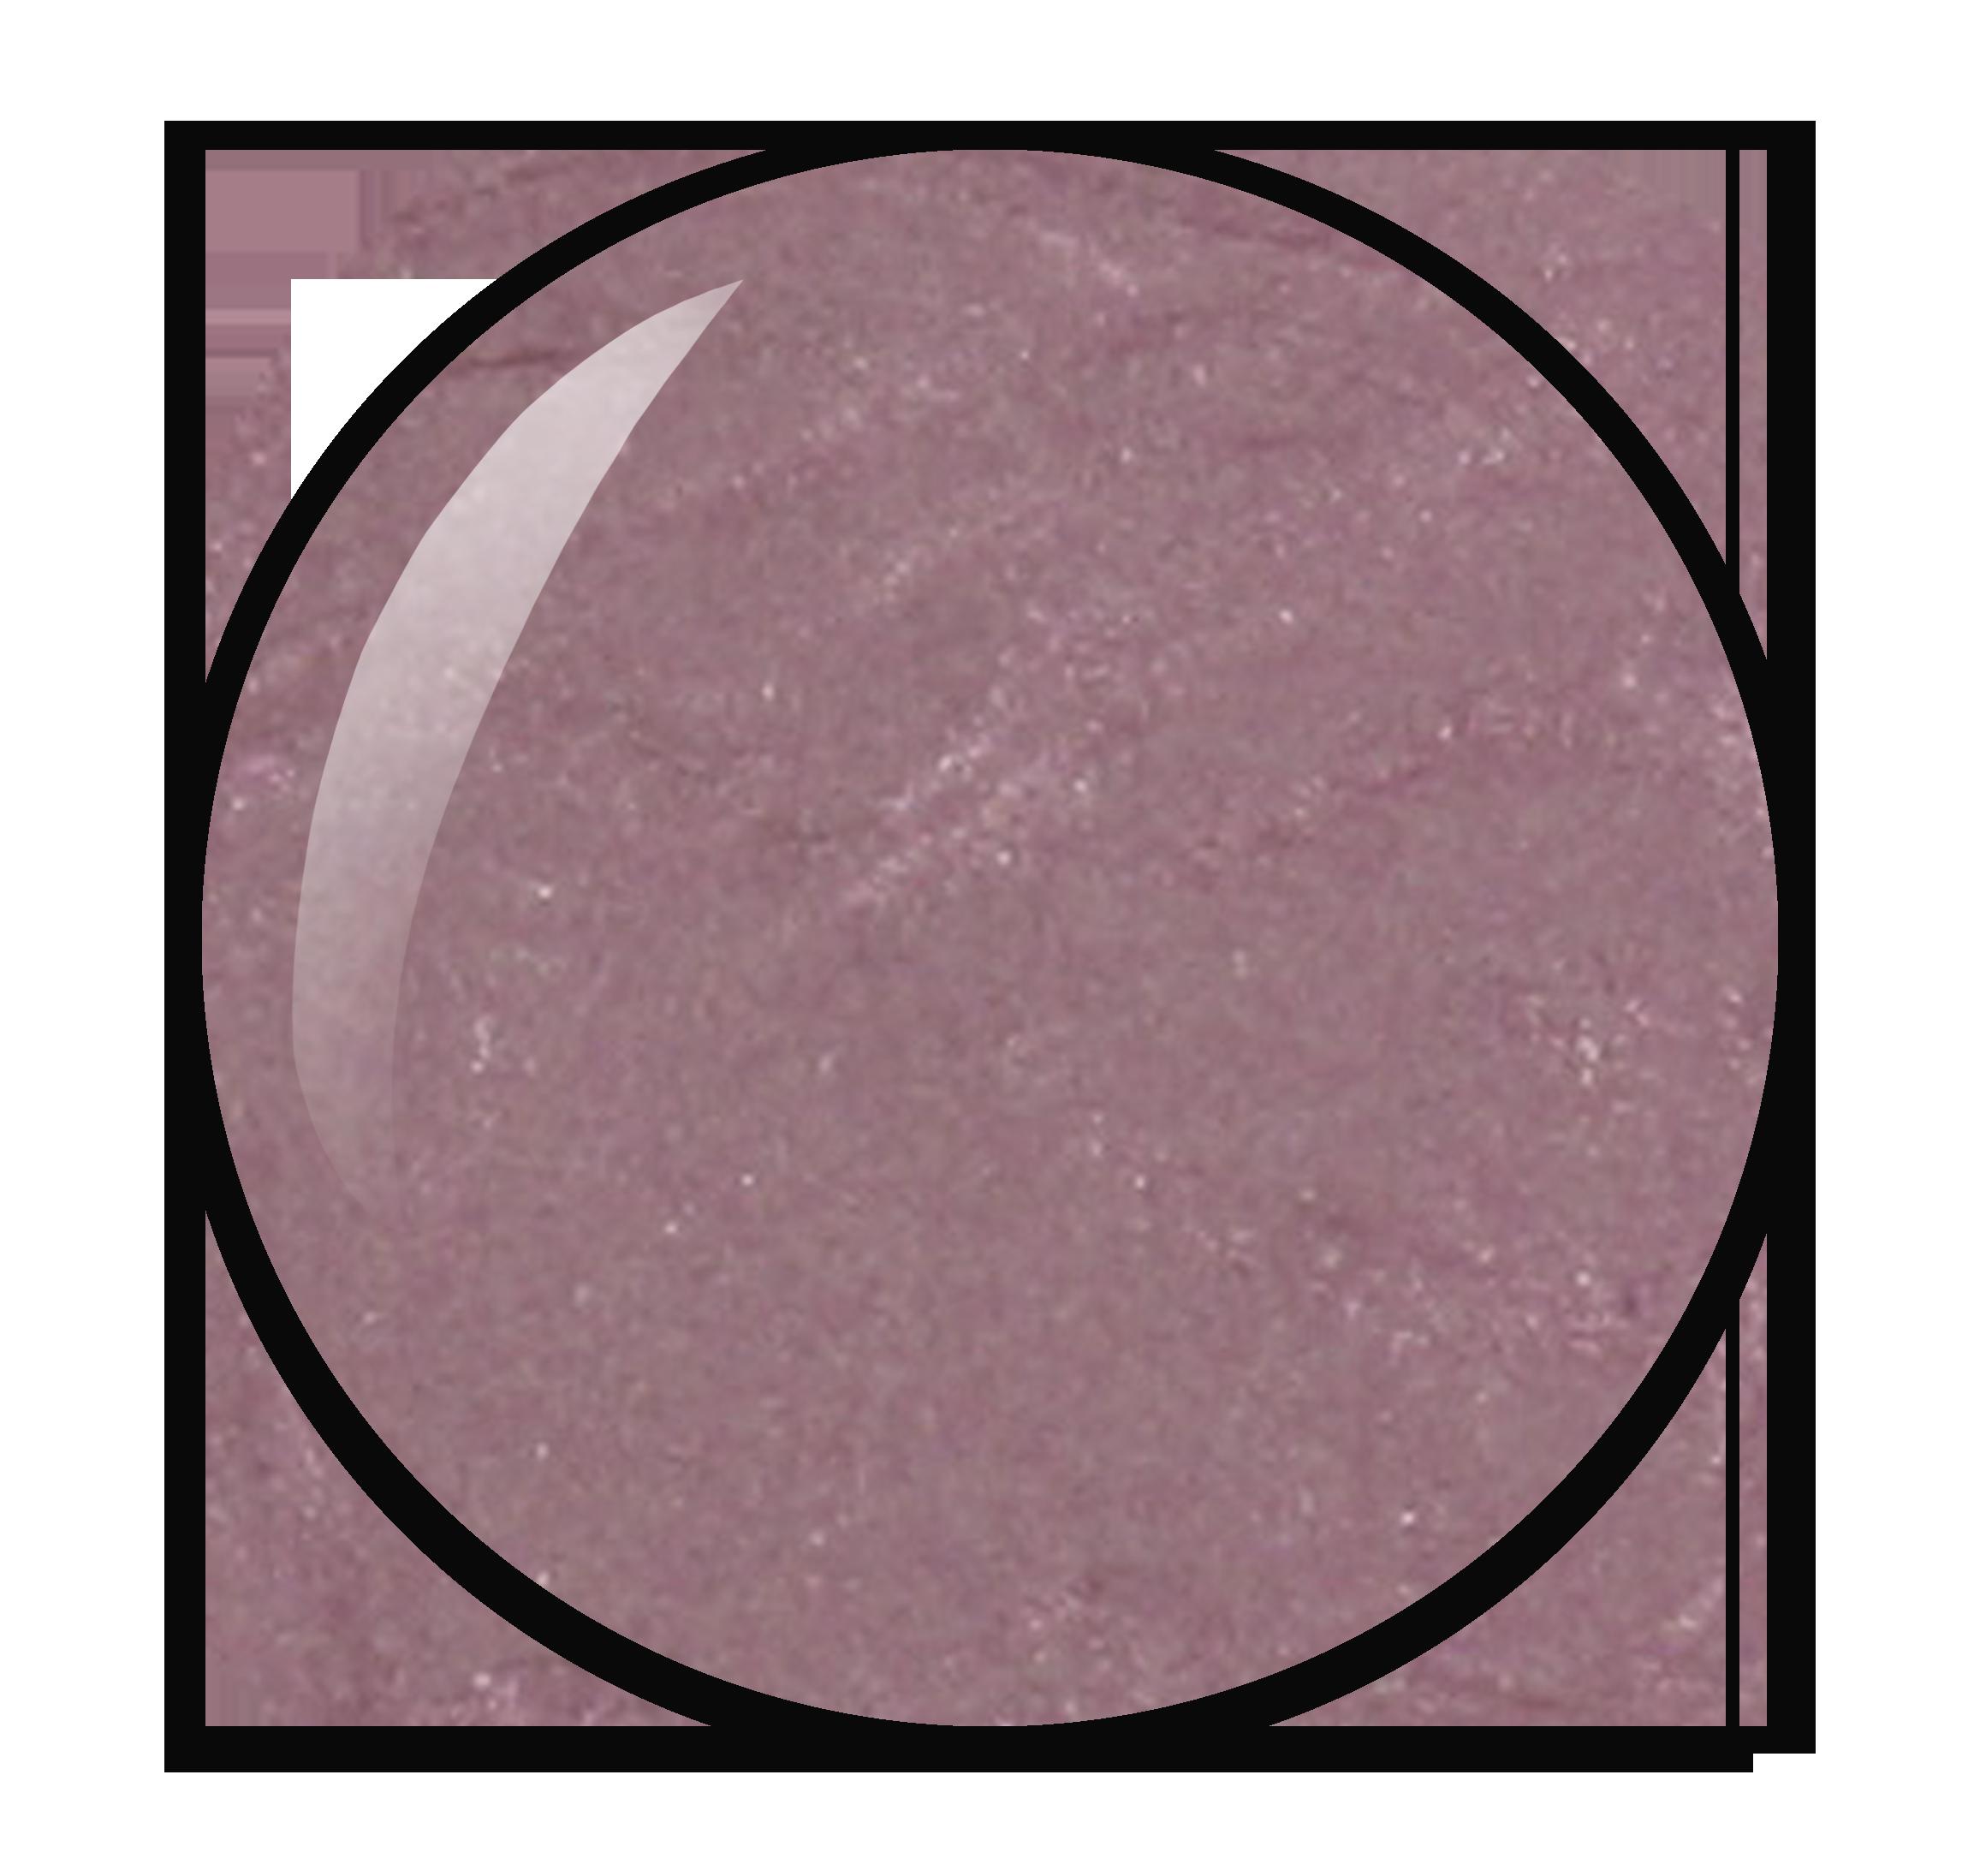 Oud roze glitter nagellak nummer 139 van de Herôme nagellak kleuren